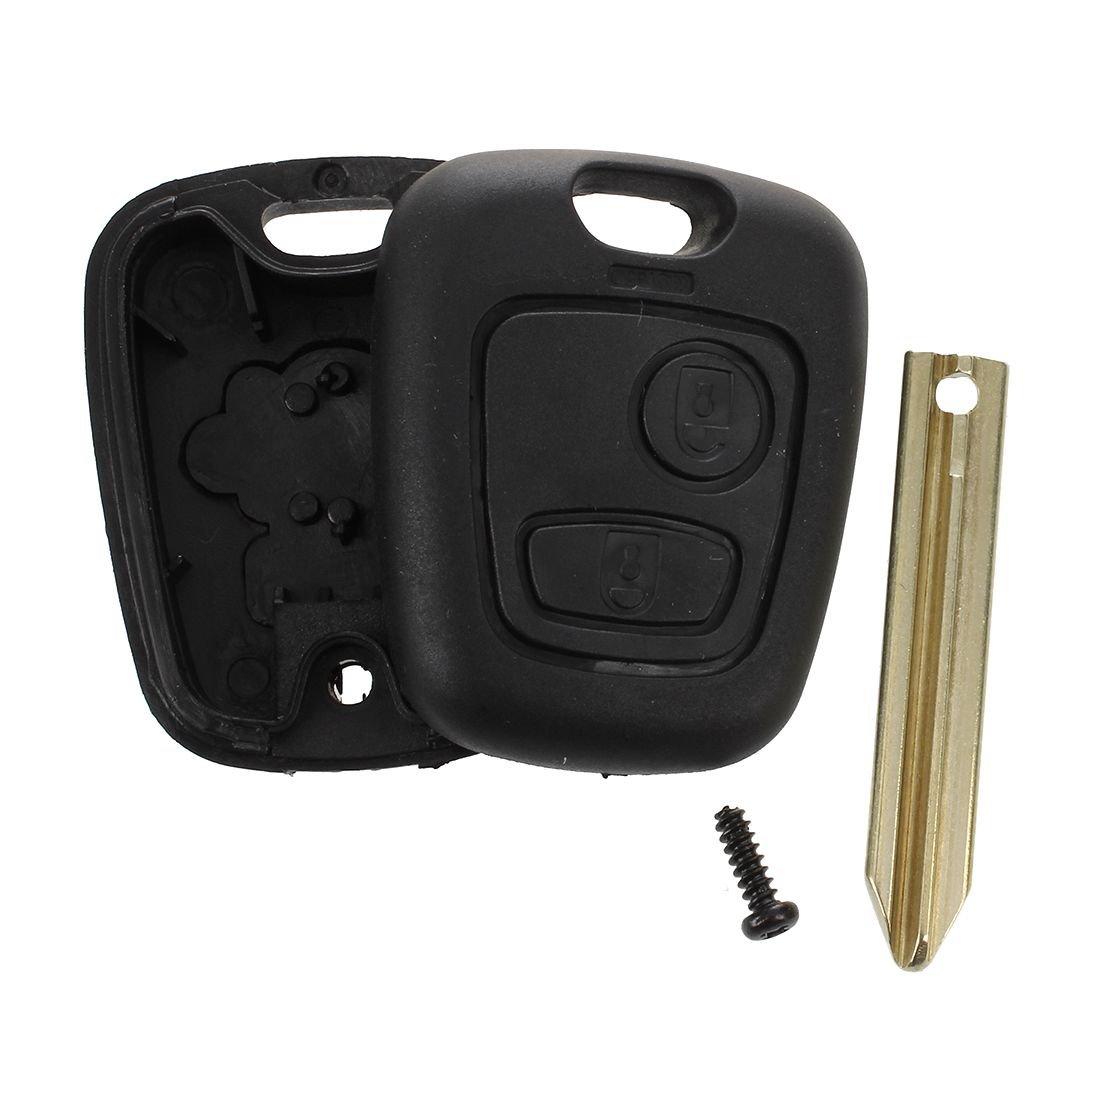 SODIAL(R) Cascara caja de llavero alarma remota de 2 botones para Citroen Saxo Xsara Picasso Berlingo